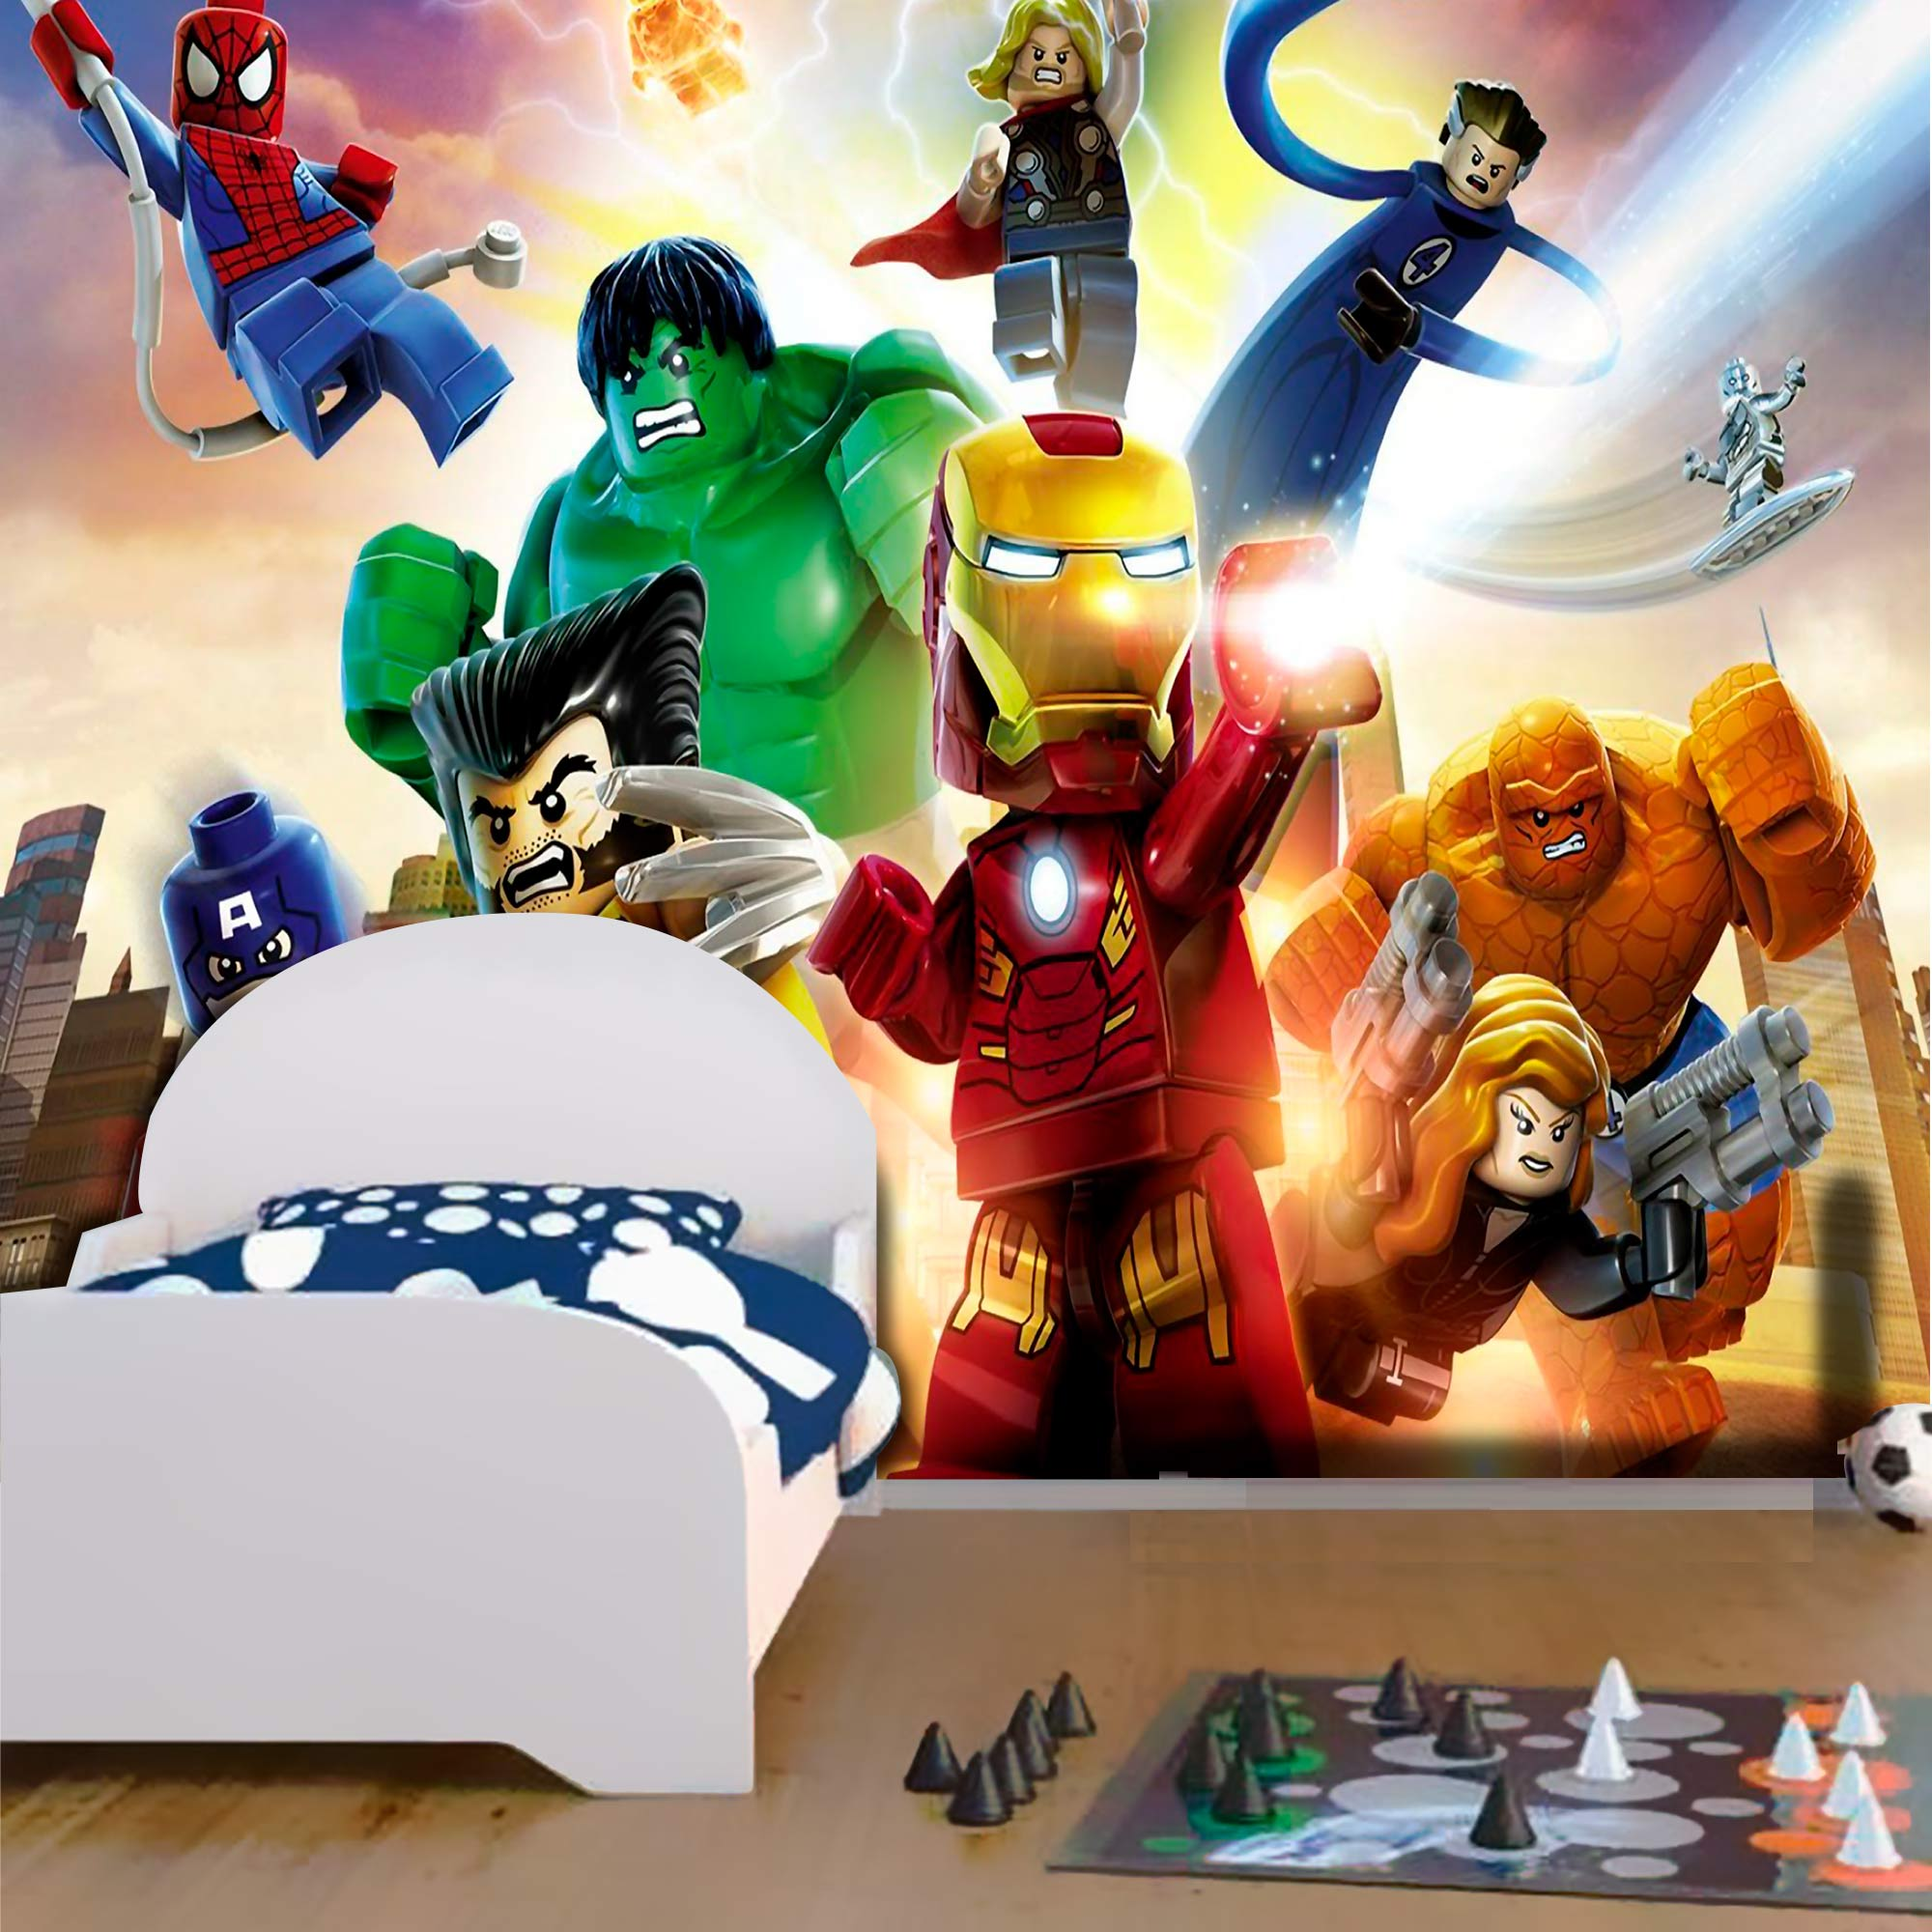 Papel De Parede Adesivo Vingadores Lego Quarteto Fantástico 1X1  - Final Decor